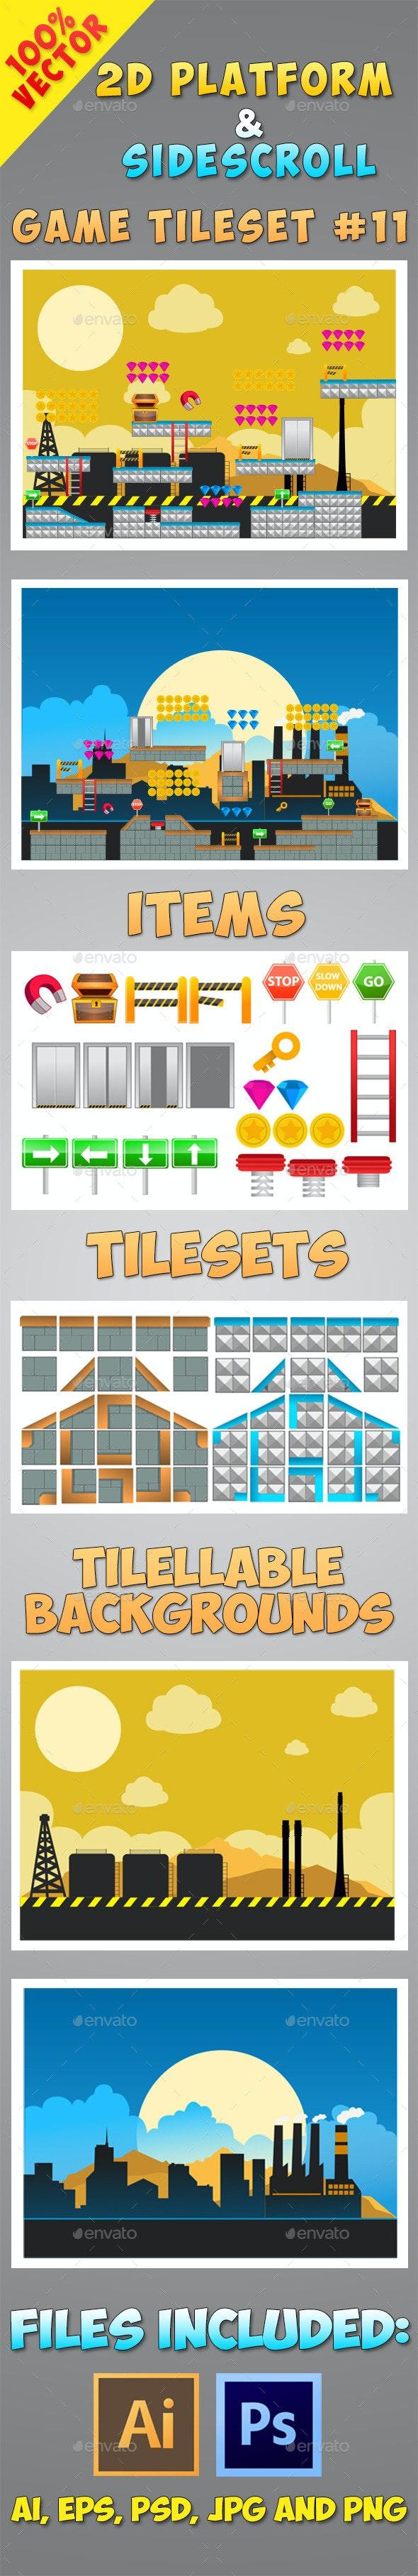 2D Platform & Sidescroll Tileset #11 - Tilesets Game Assets